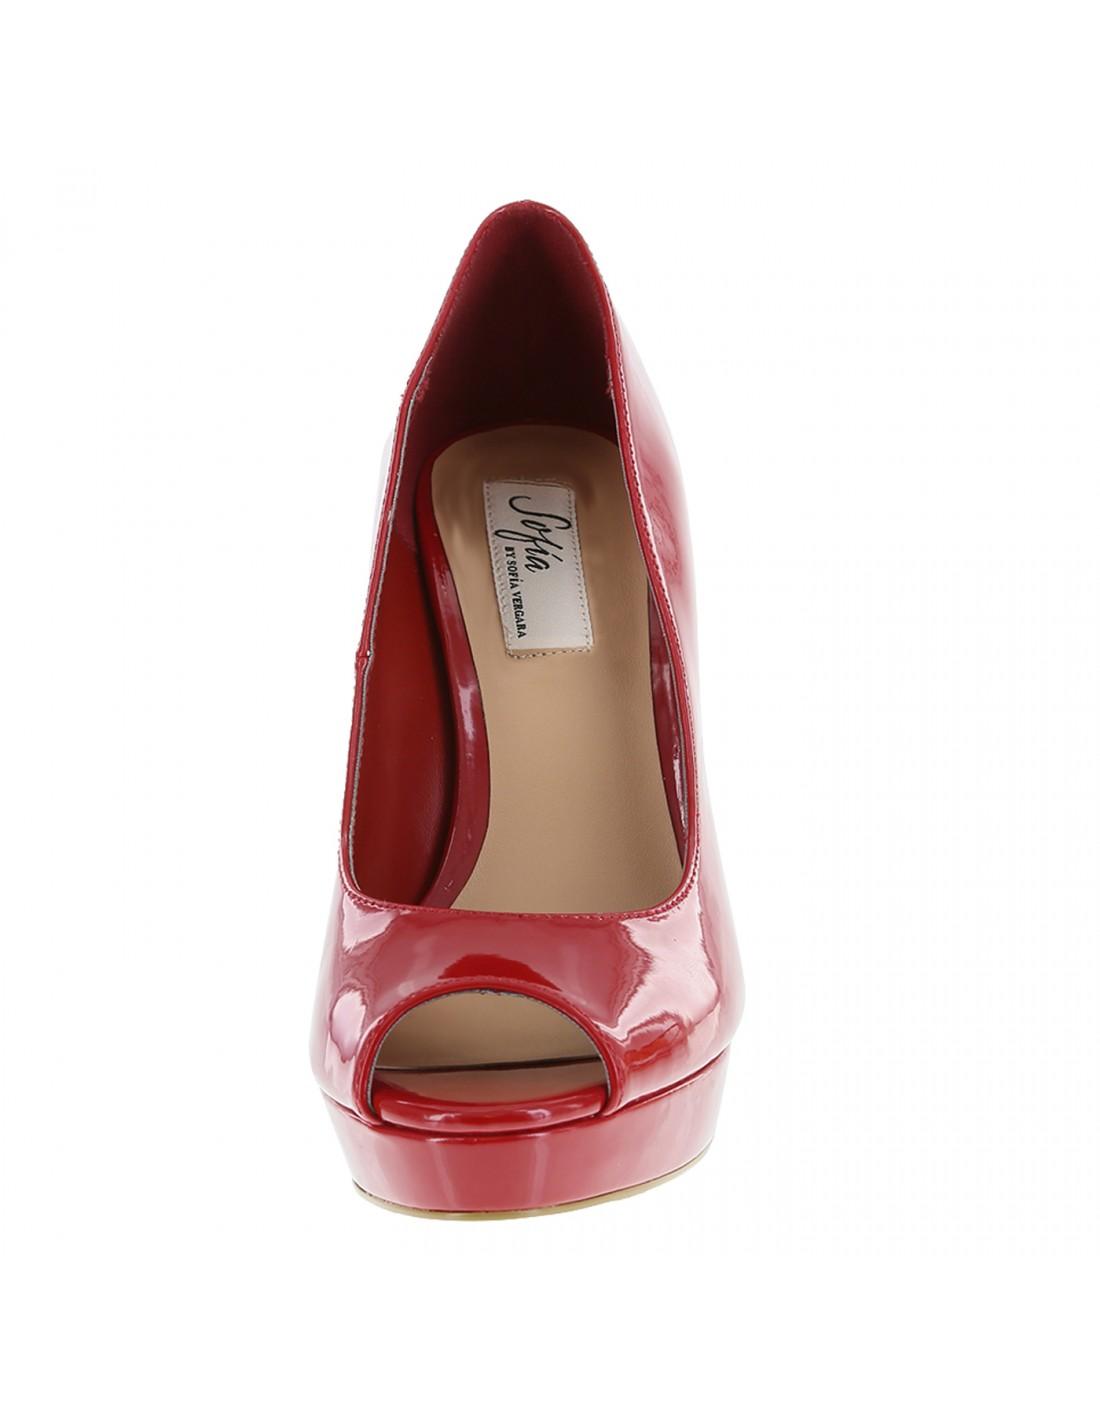 ab75845a810 Zapatos Sofía Vergara Peep Toe Plataforma - Rojo. ¡En oferta!